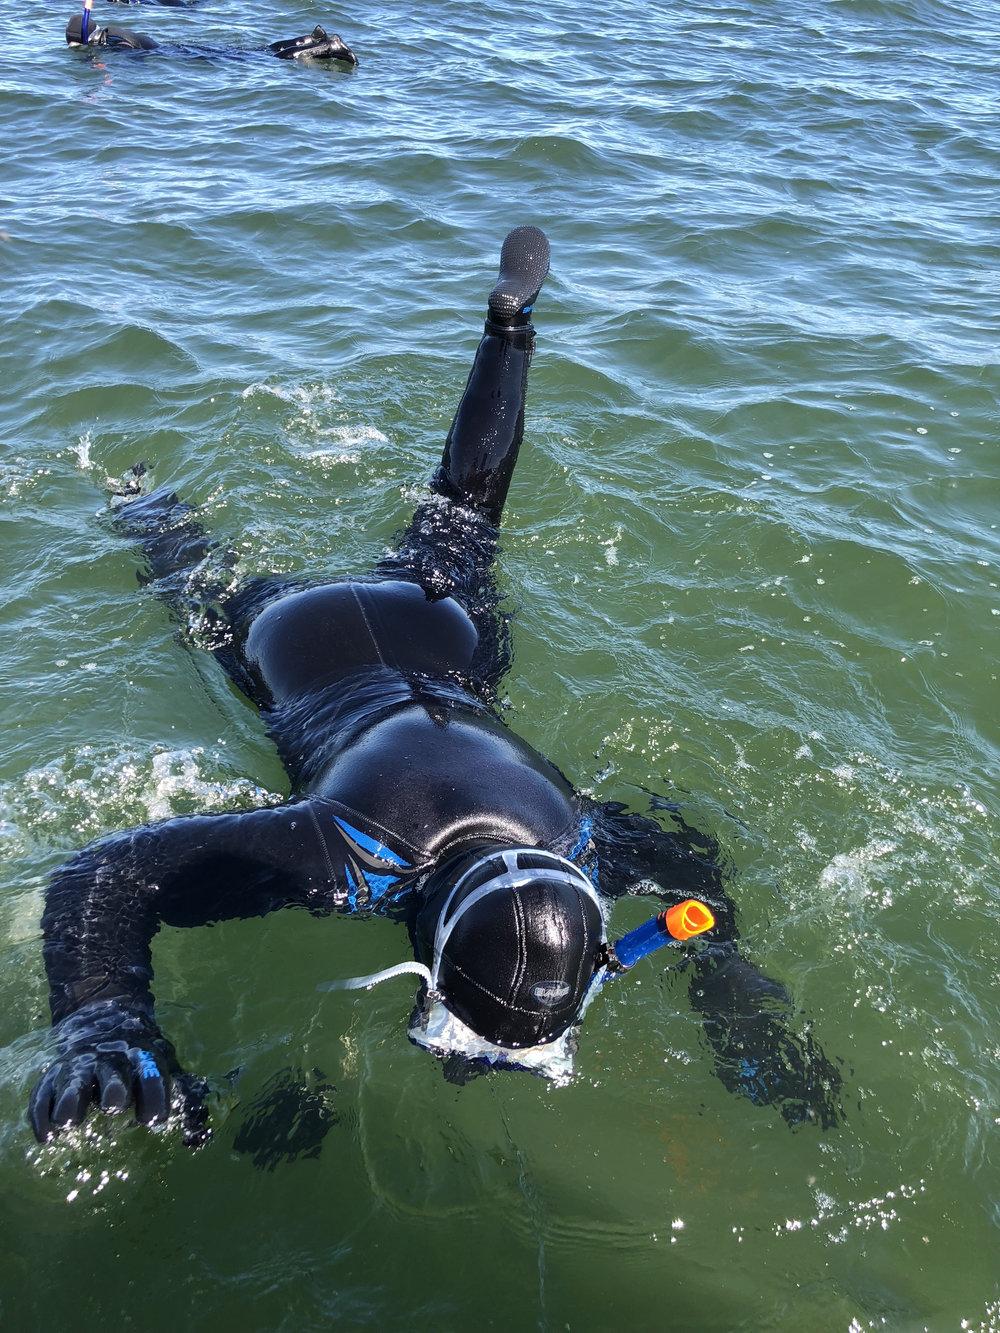 teri_arctic_snorkeling_whales_spiritedtable22.jpg